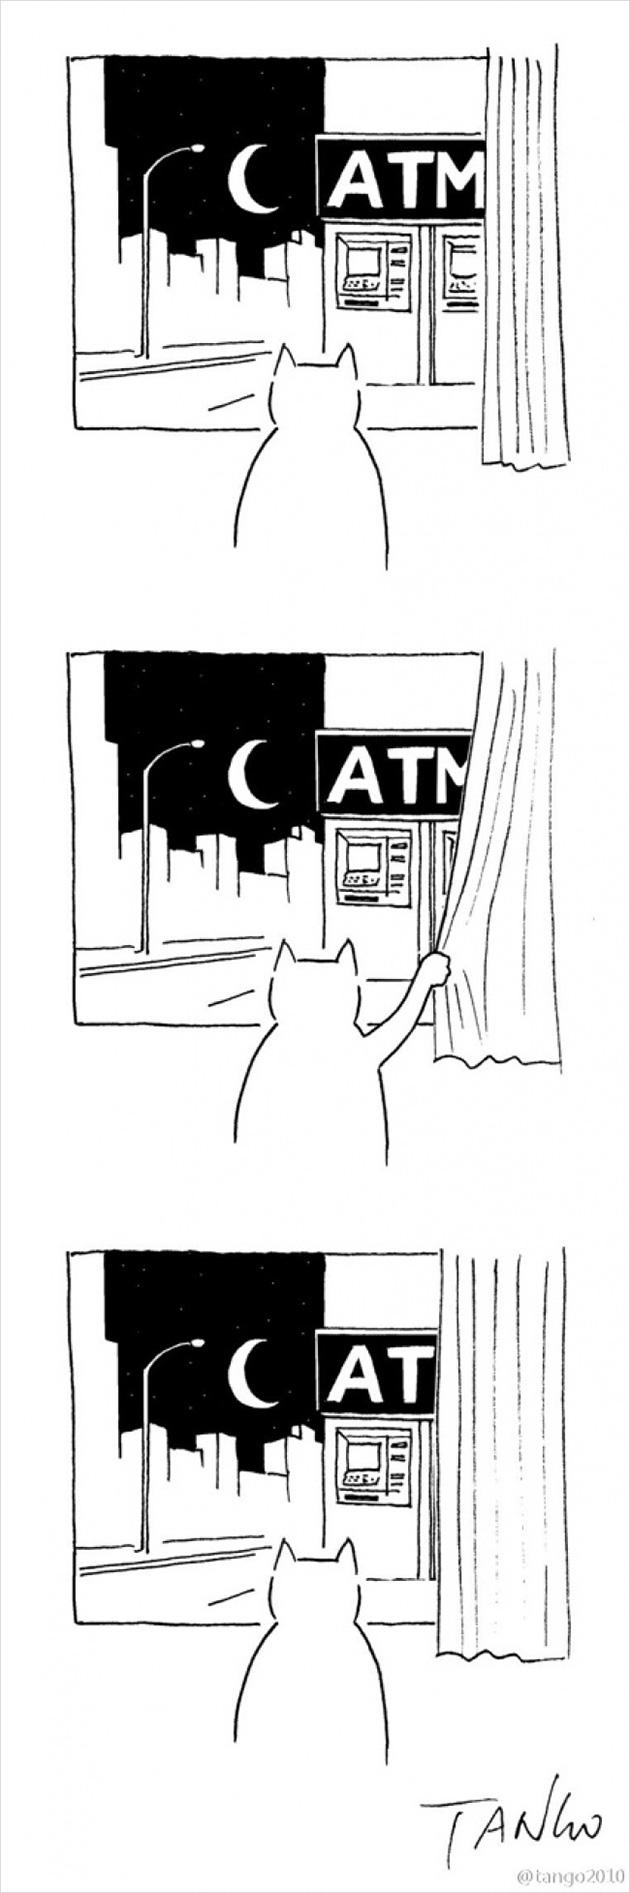 comic strips by tango 3 - 세상을 귀엽고 재치있게 표현하는 작가 '상하이 탱고' 연재 만화 16편